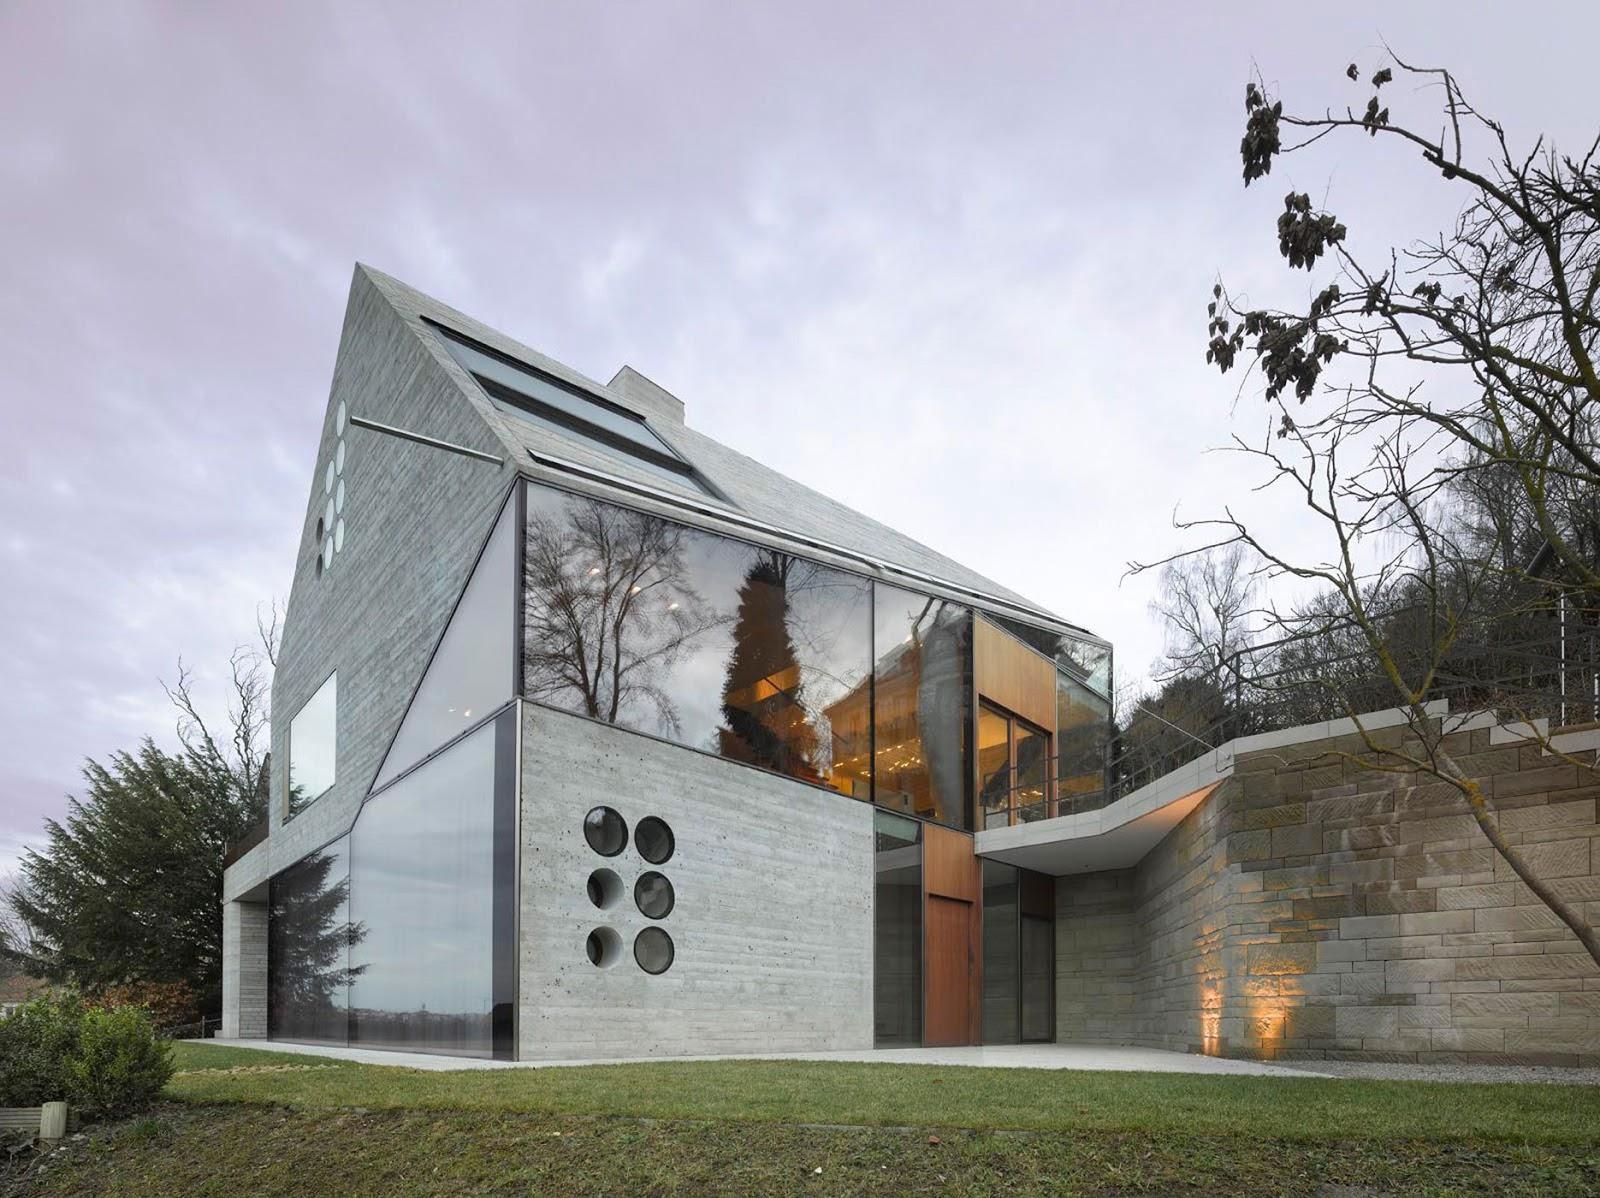 house 36 in stuttgart germany by mbas architekten. Black Bedroom Furniture Sets. Home Design Ideas